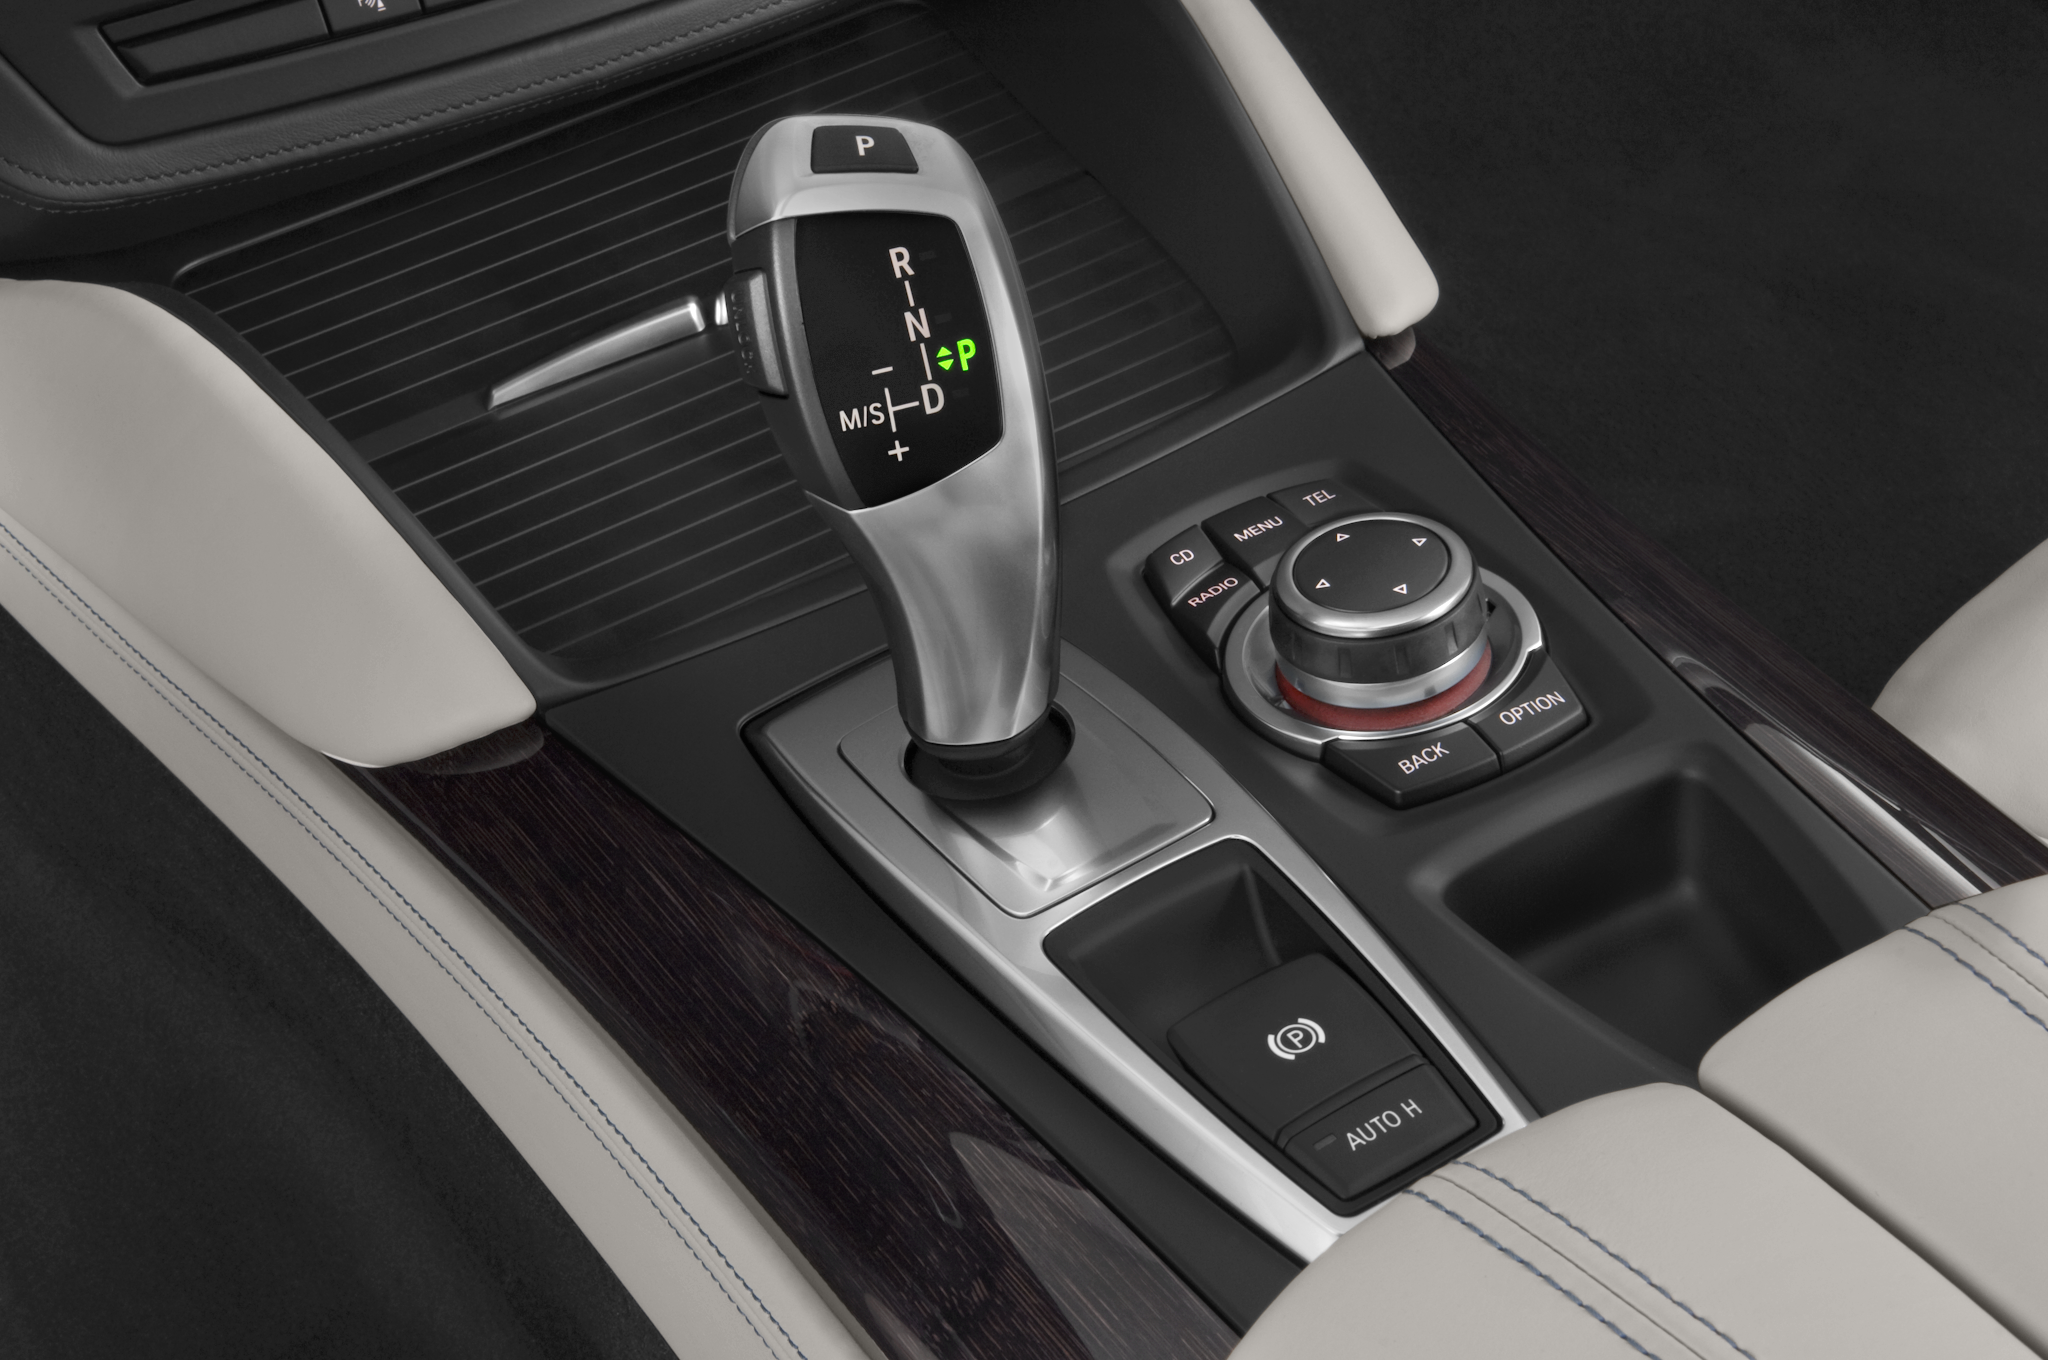 2010 BMW ActiveHybrid X6 - BMW Hybrid SUV Review - Automobile Magazine